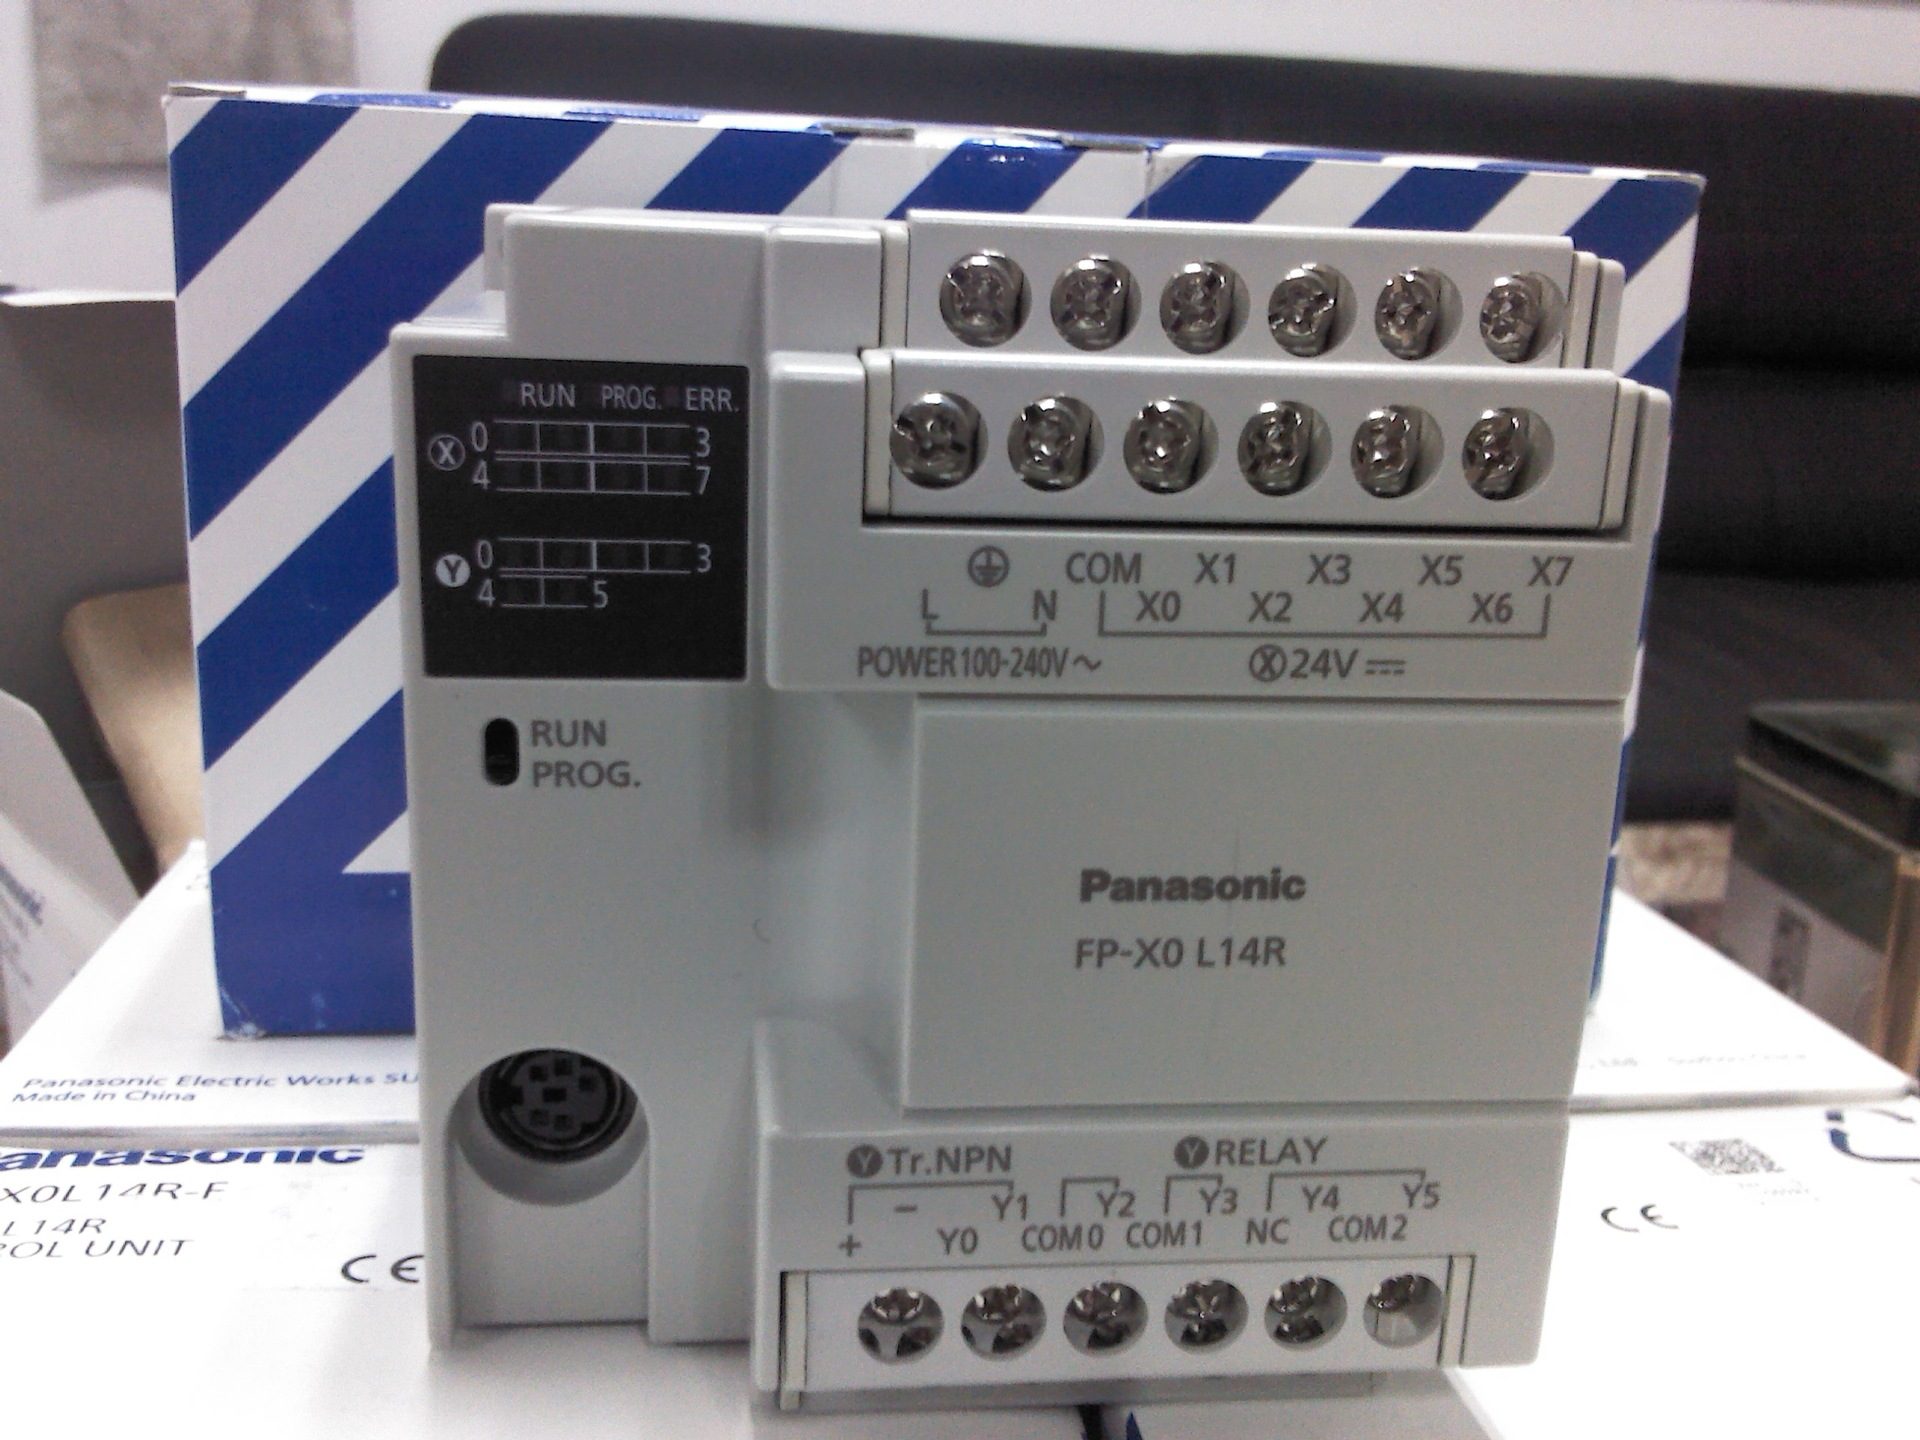 AFPX0L14R_松下FPX0-L14R控制器_AFPX0L14R-F